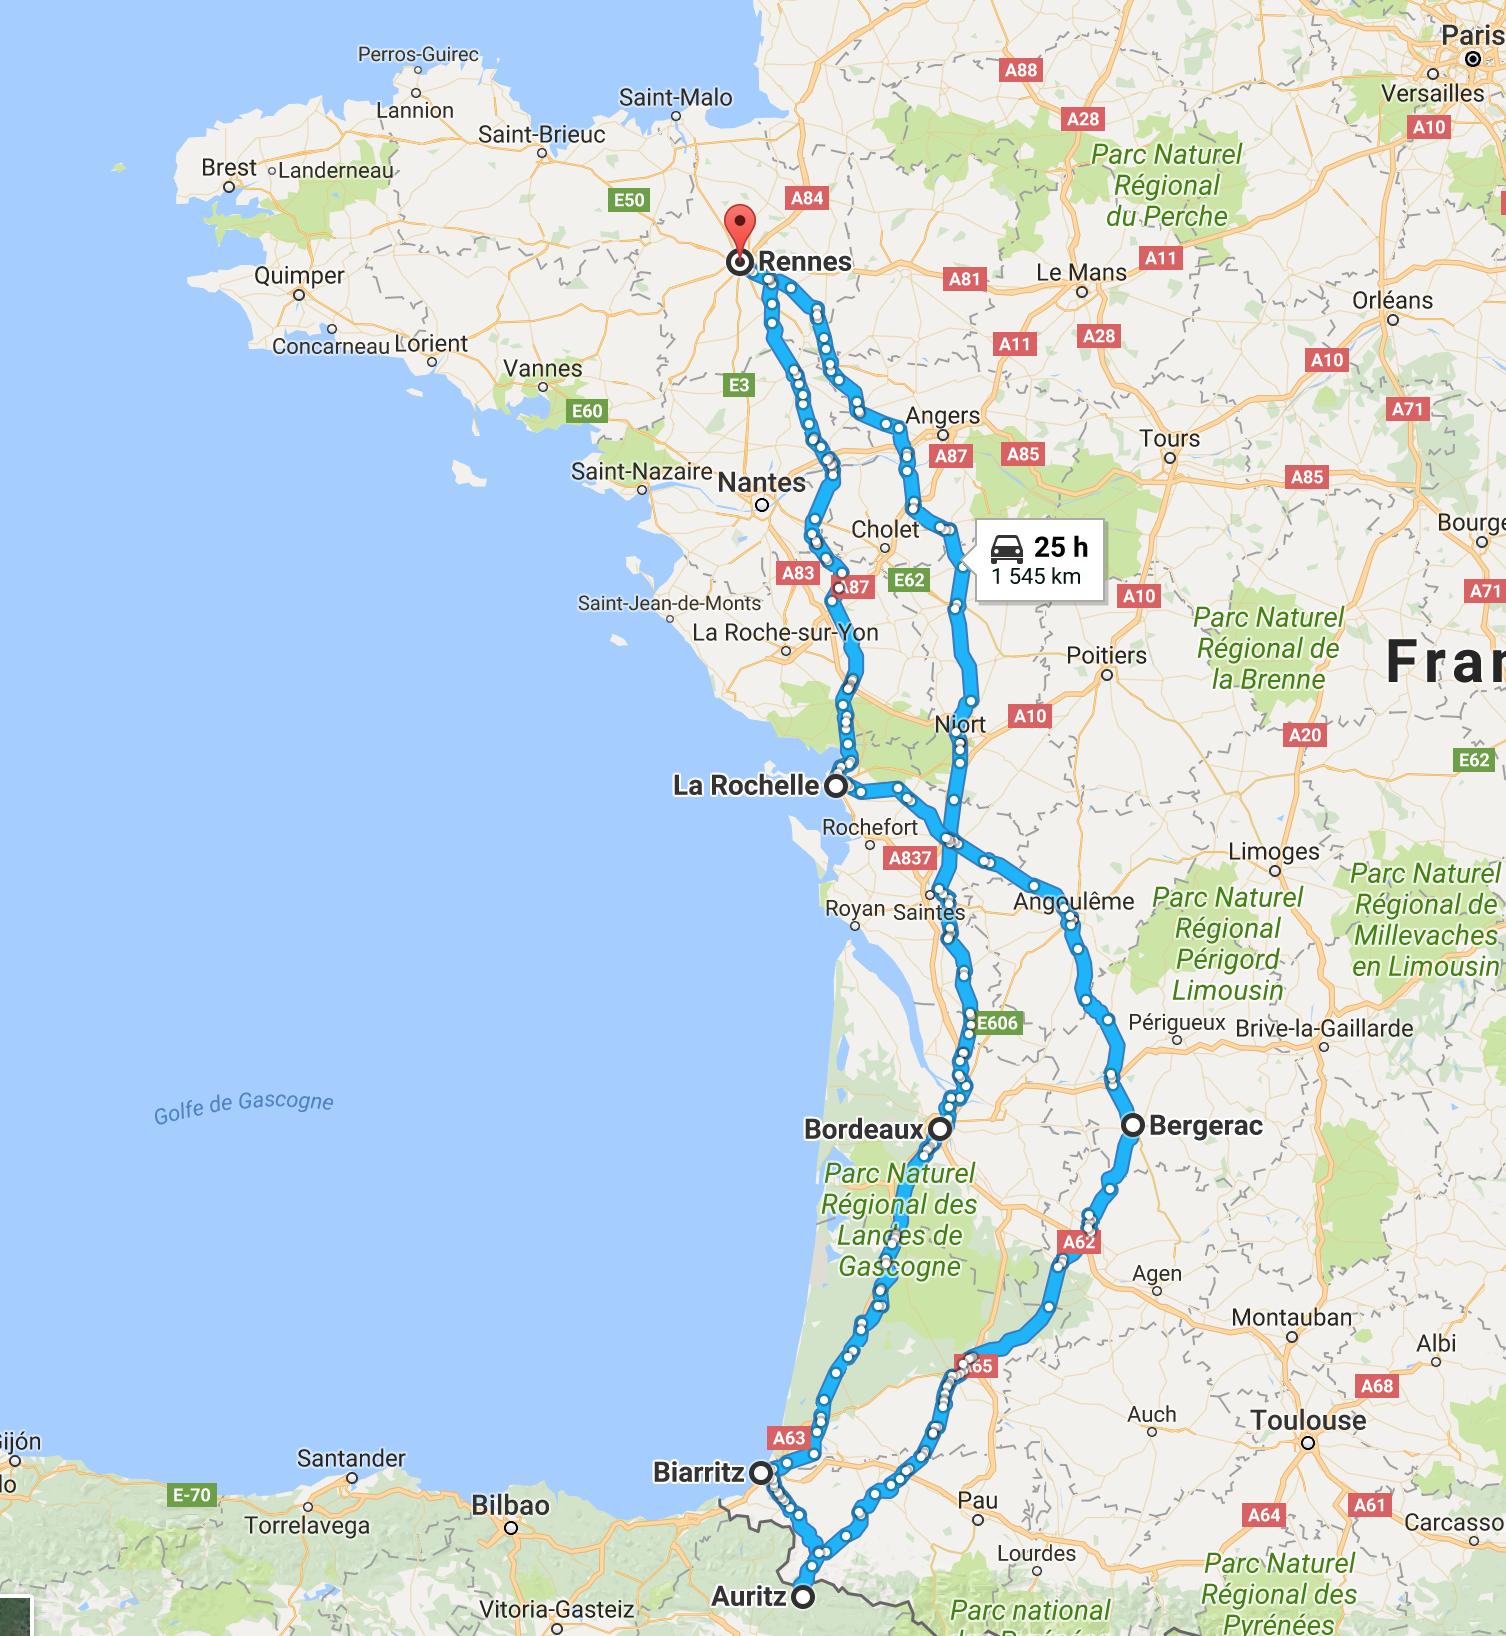 balade moto : direction Biarritz en Aquitaine